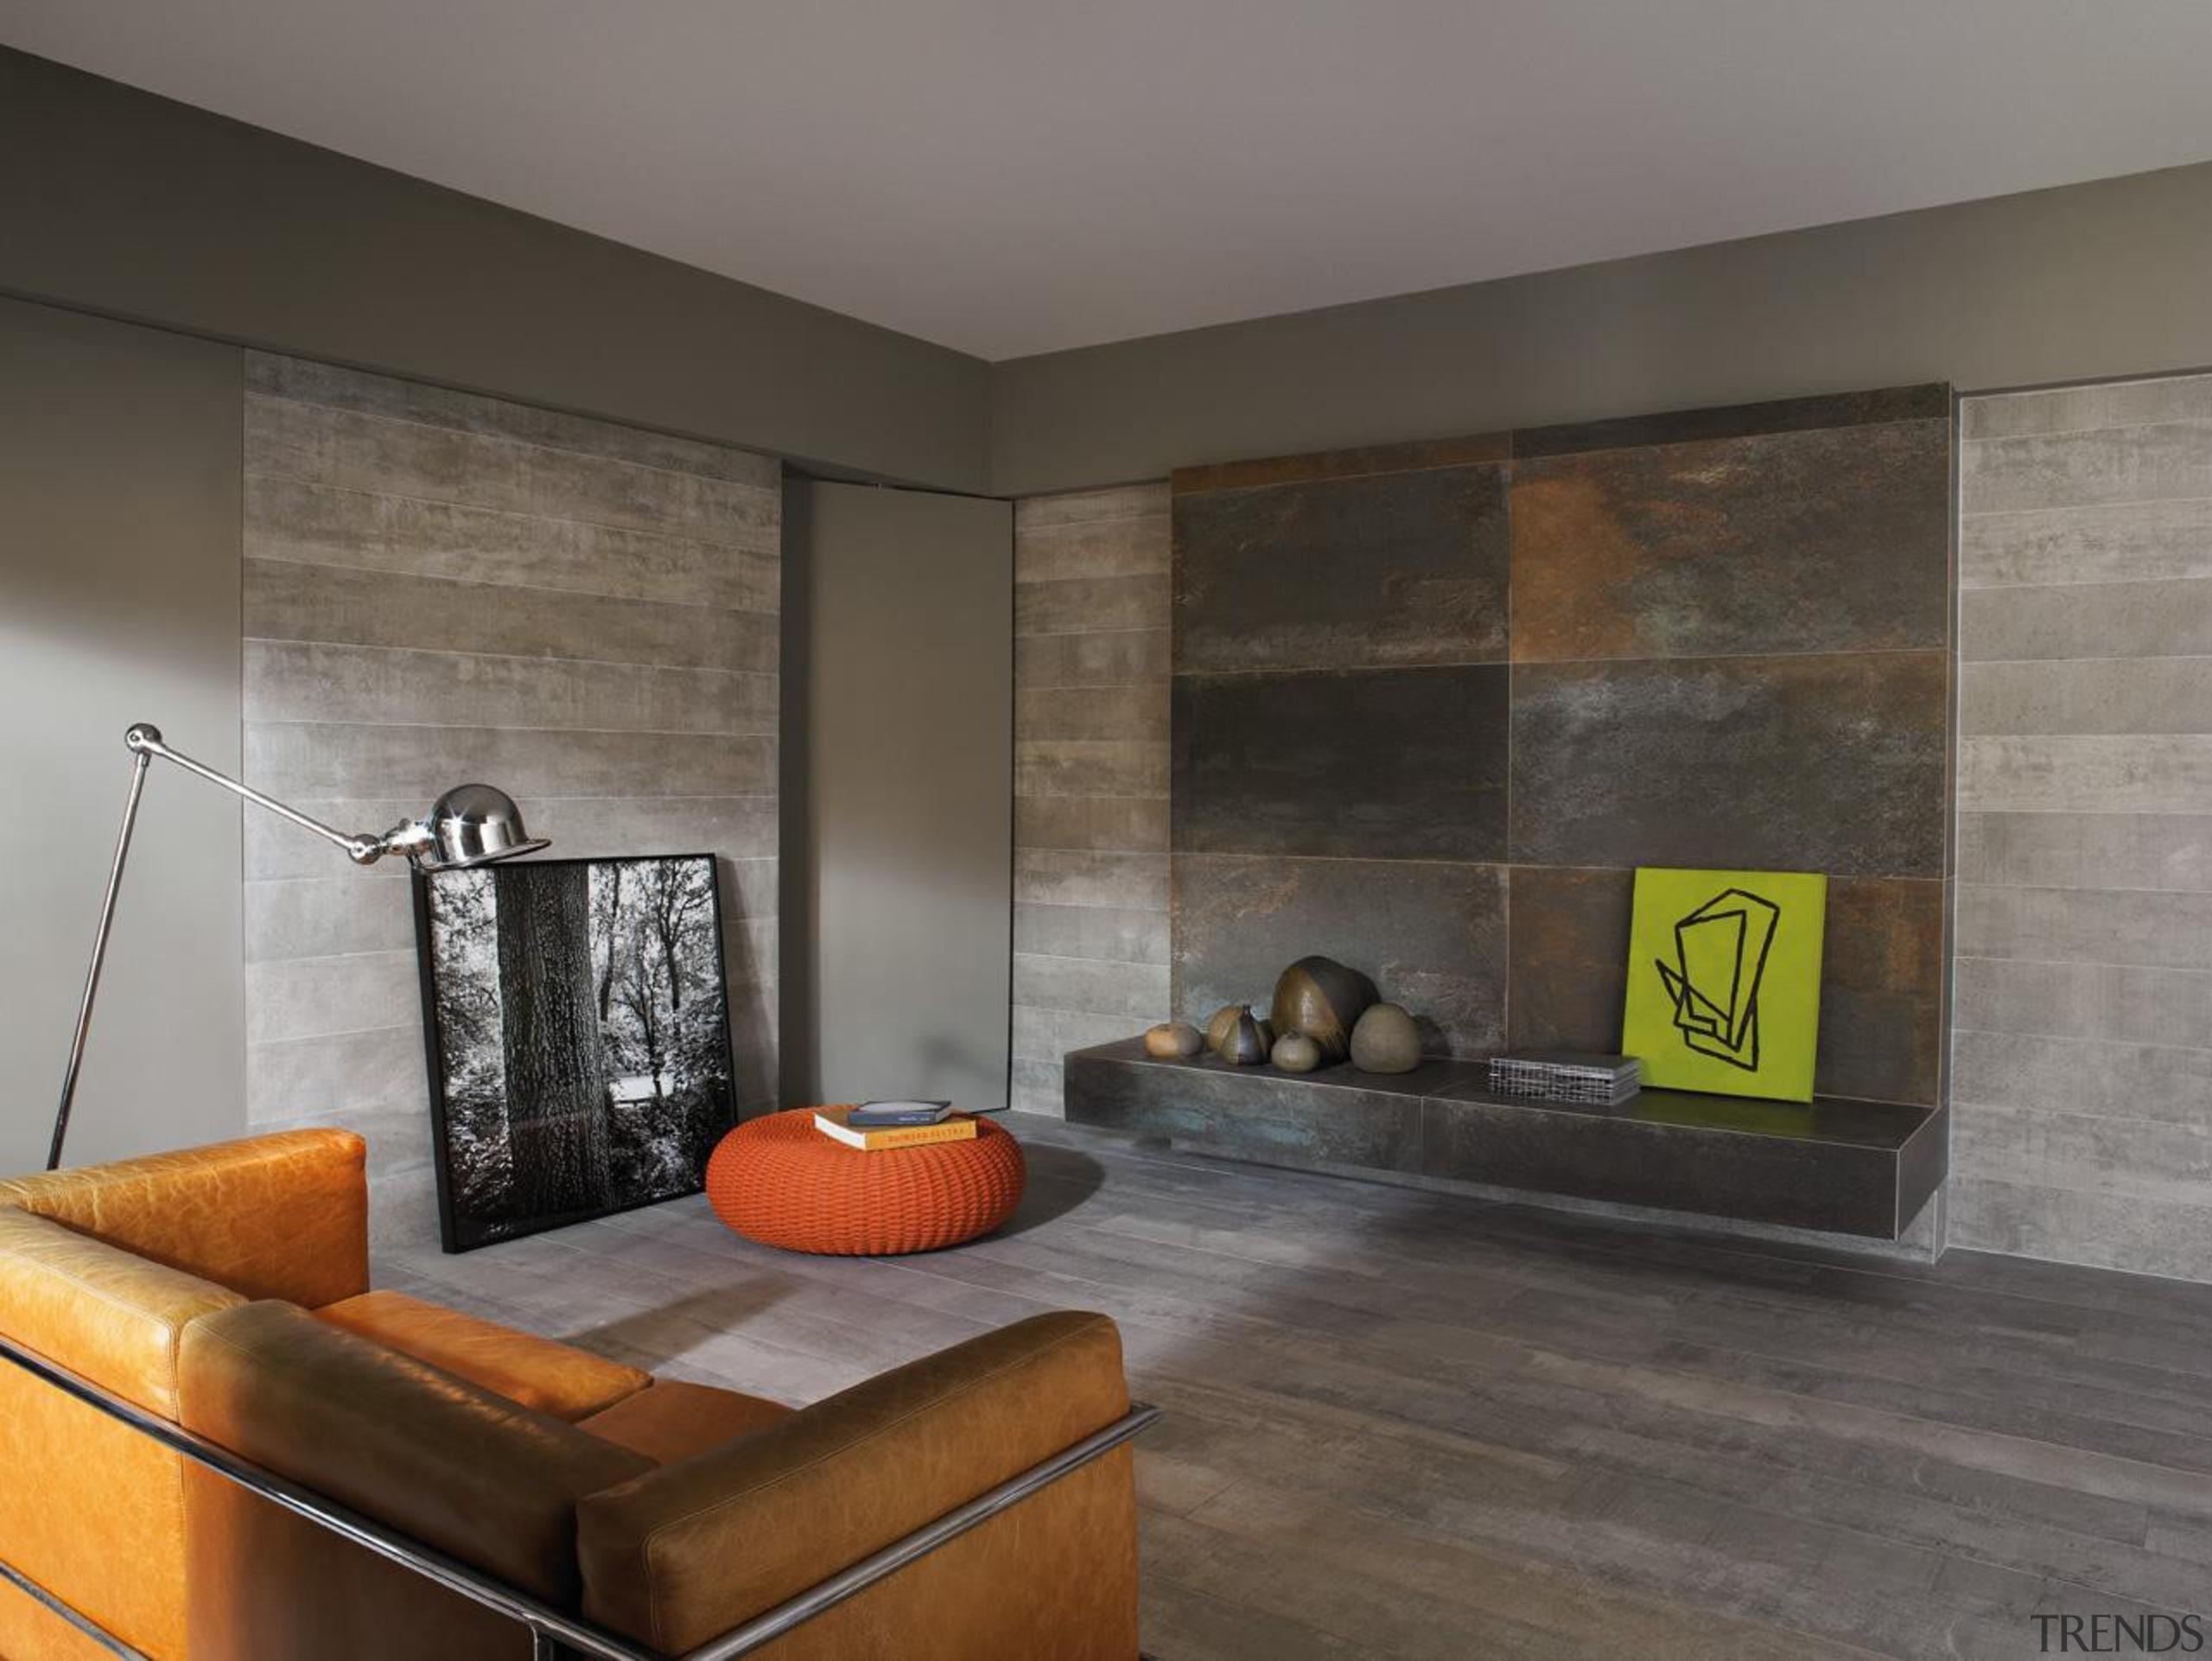 Floor and walls of this modern industrial style ceiling, floor, flooring, interior design, living room, room, wall, wood flooring, gray, black